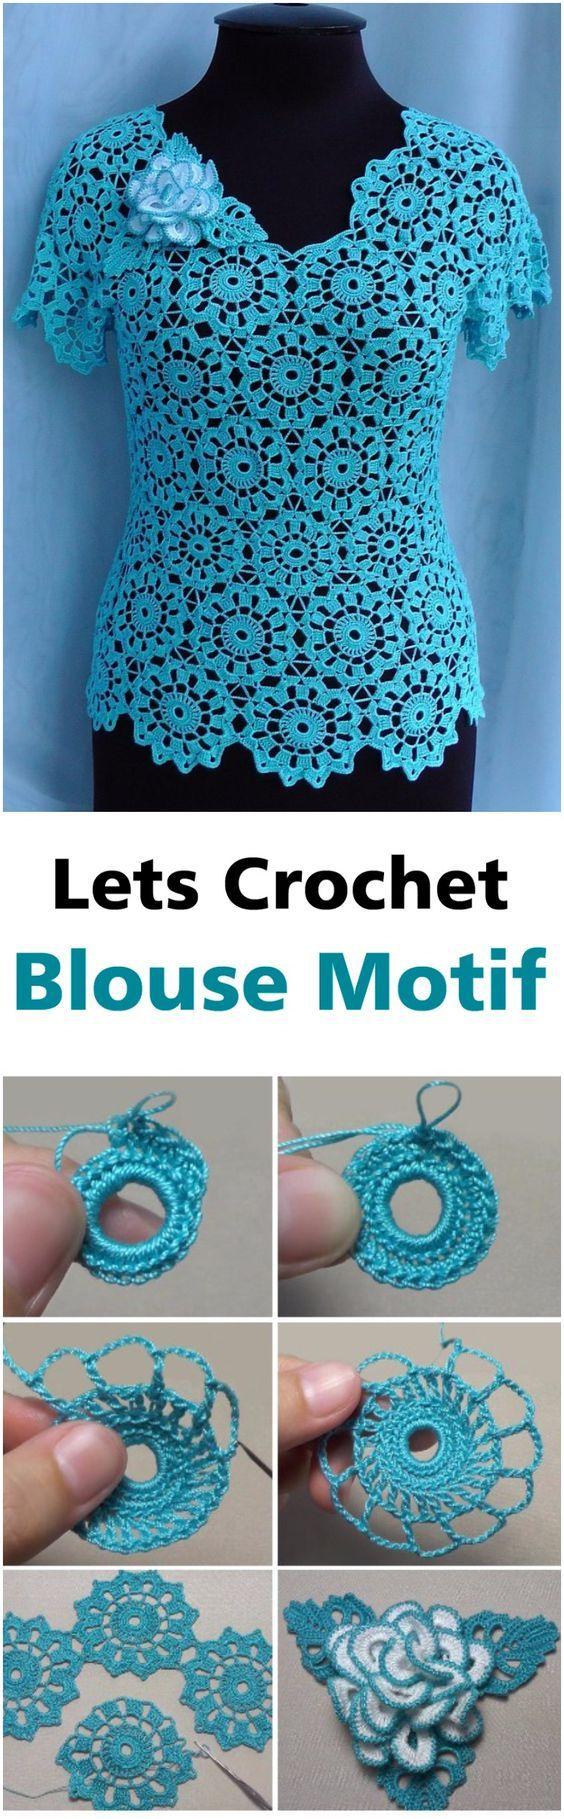 Blouse Motif Crochet